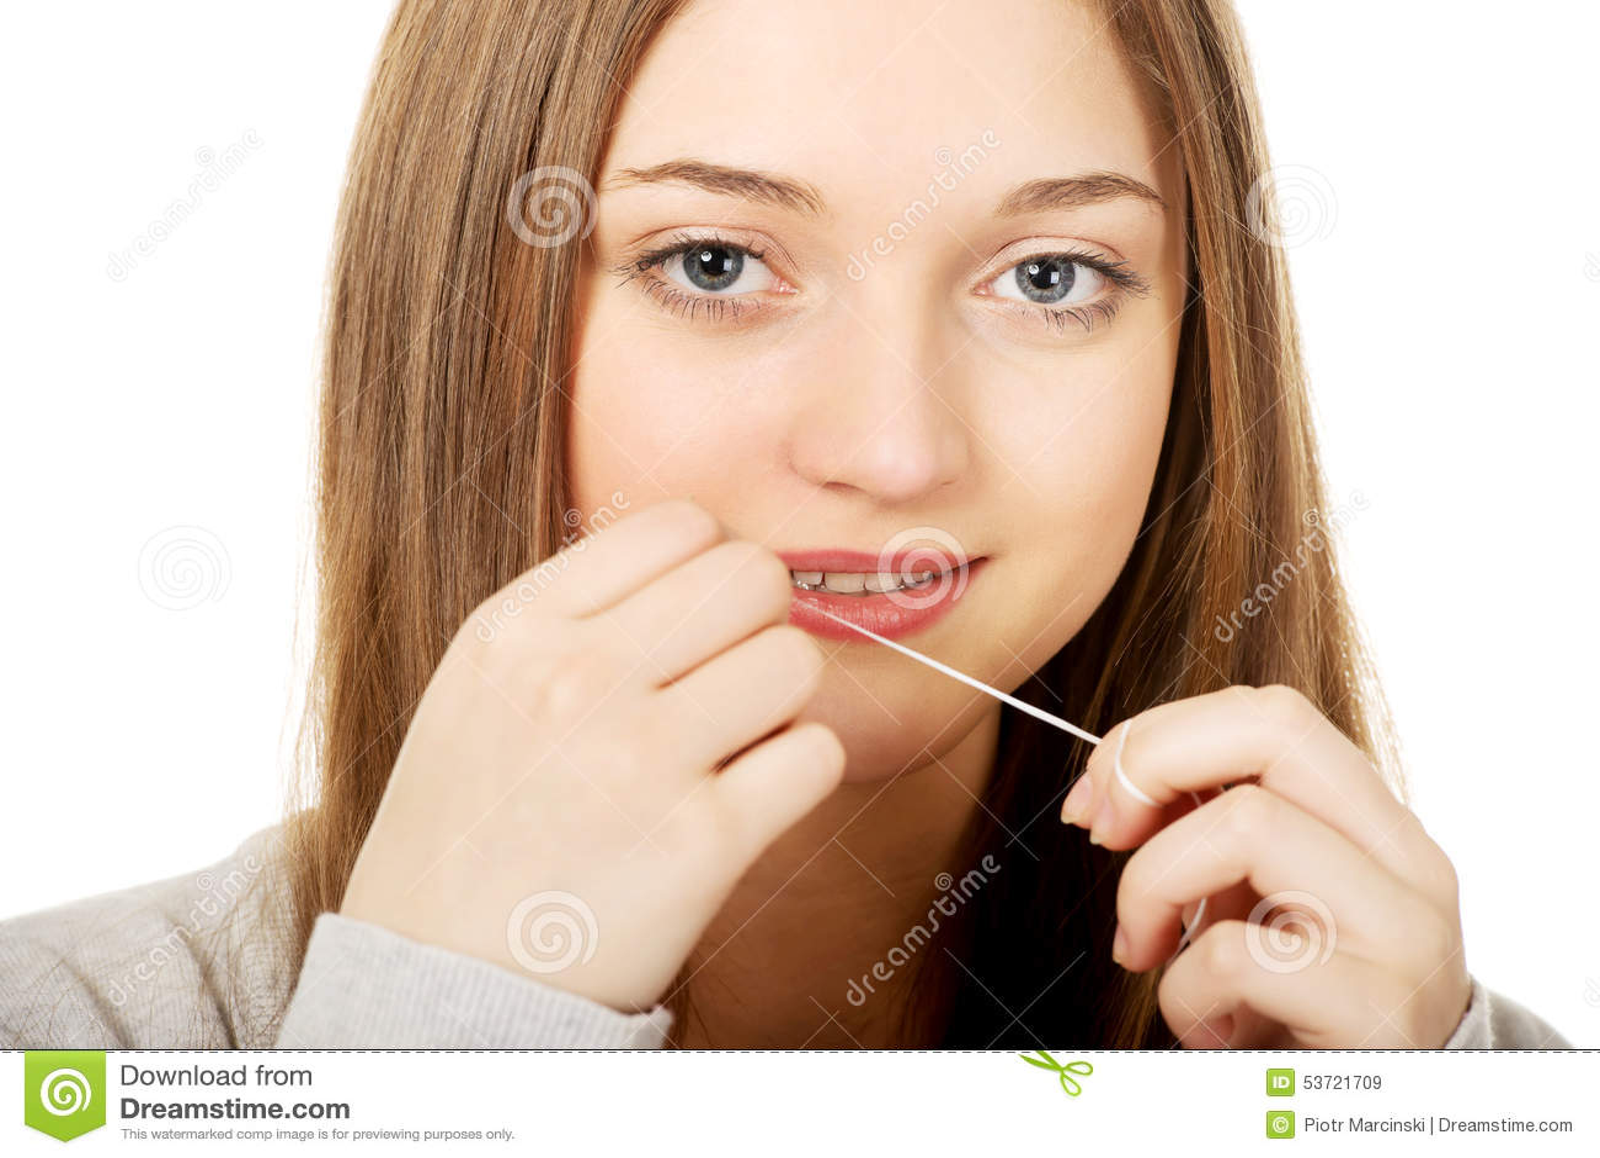 sexo online gratis mulheres de fio dental